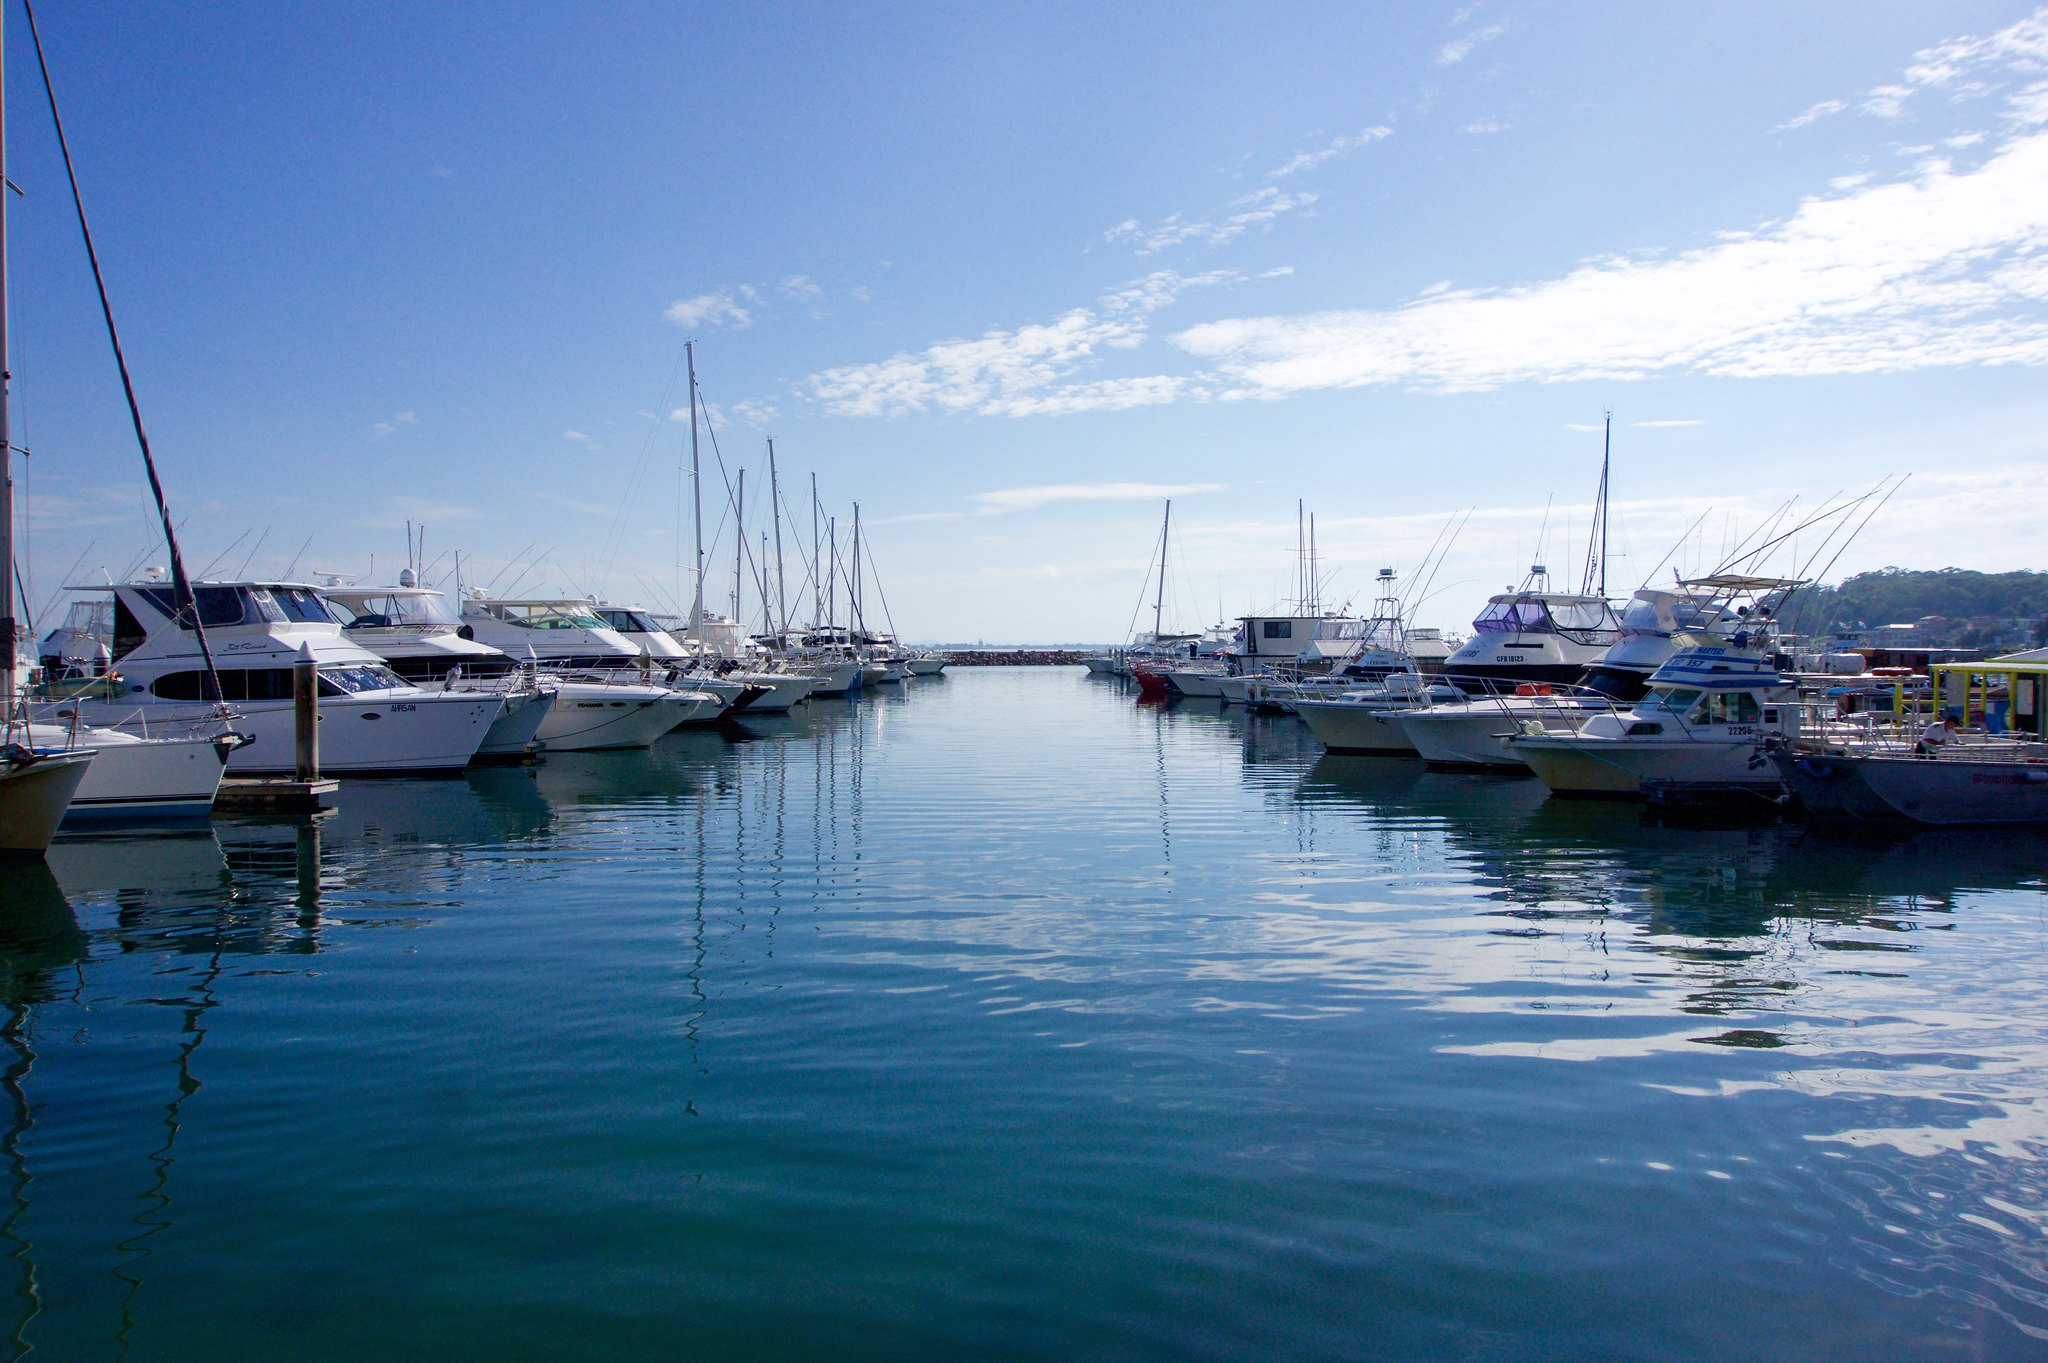 Port Stephens Pier